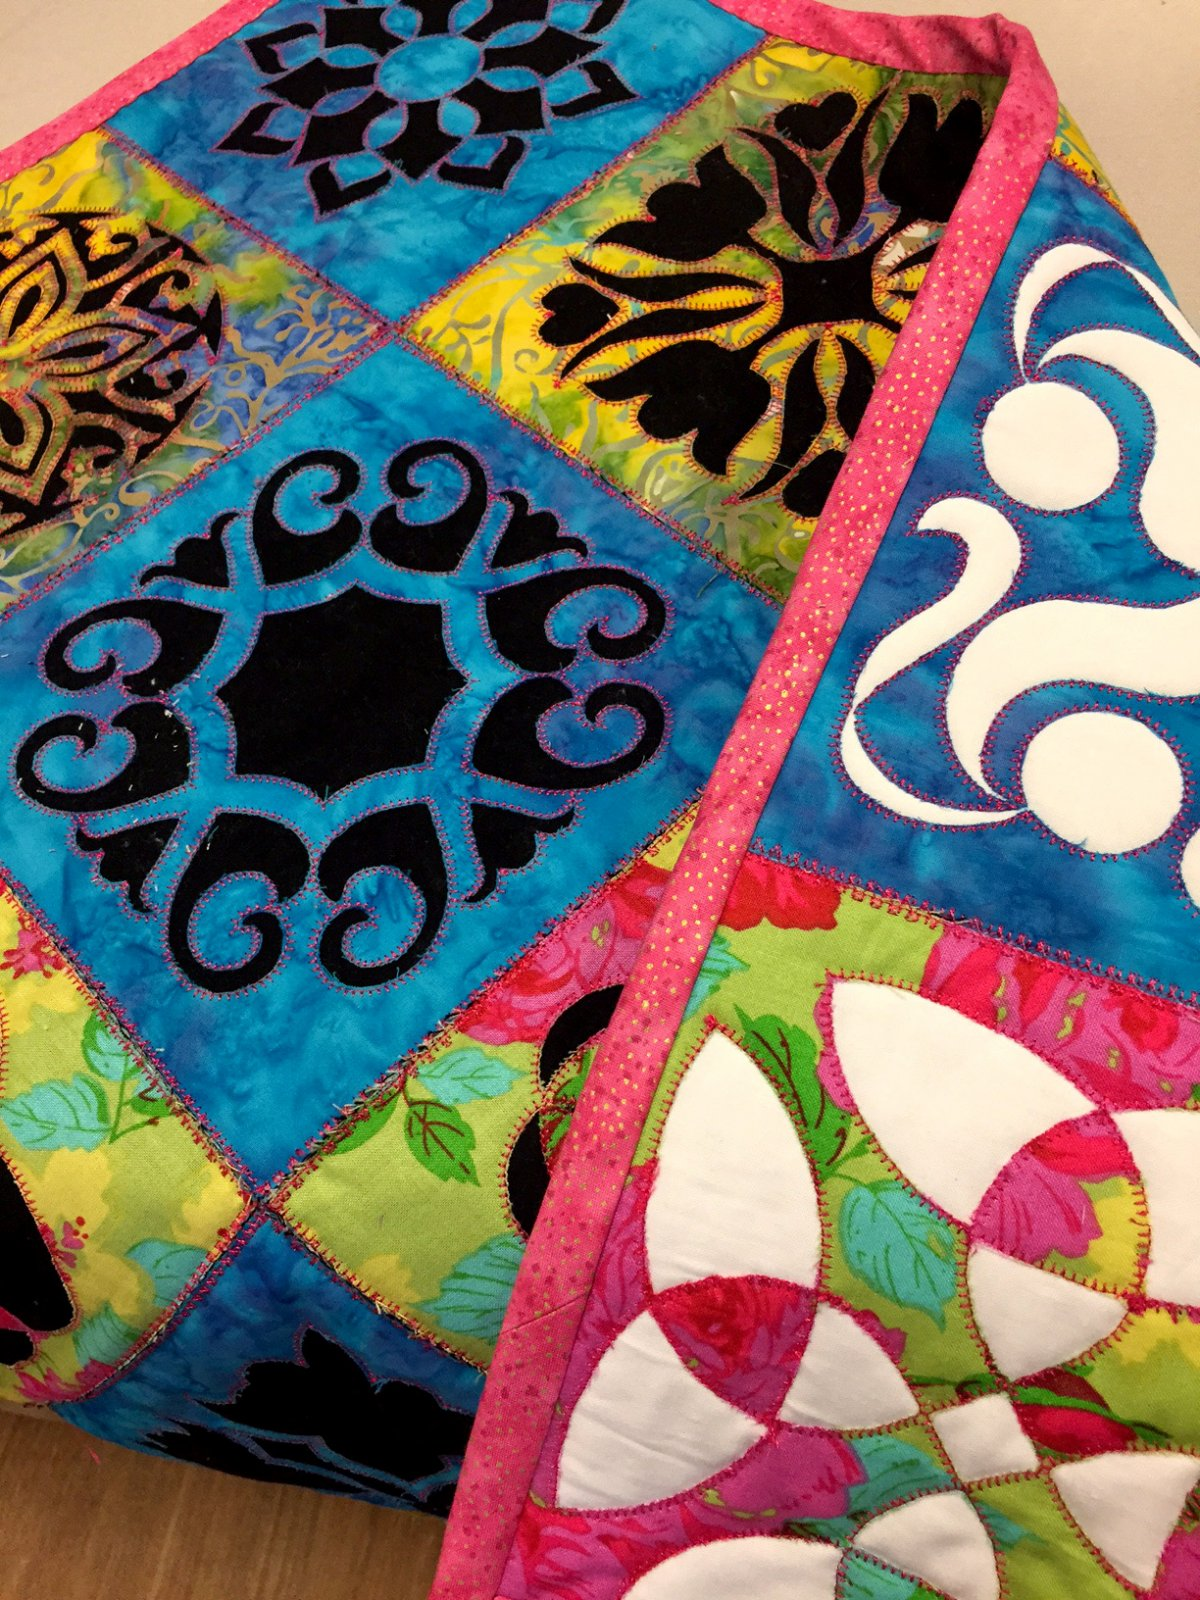 Reverse applique embroidery designs makaroka